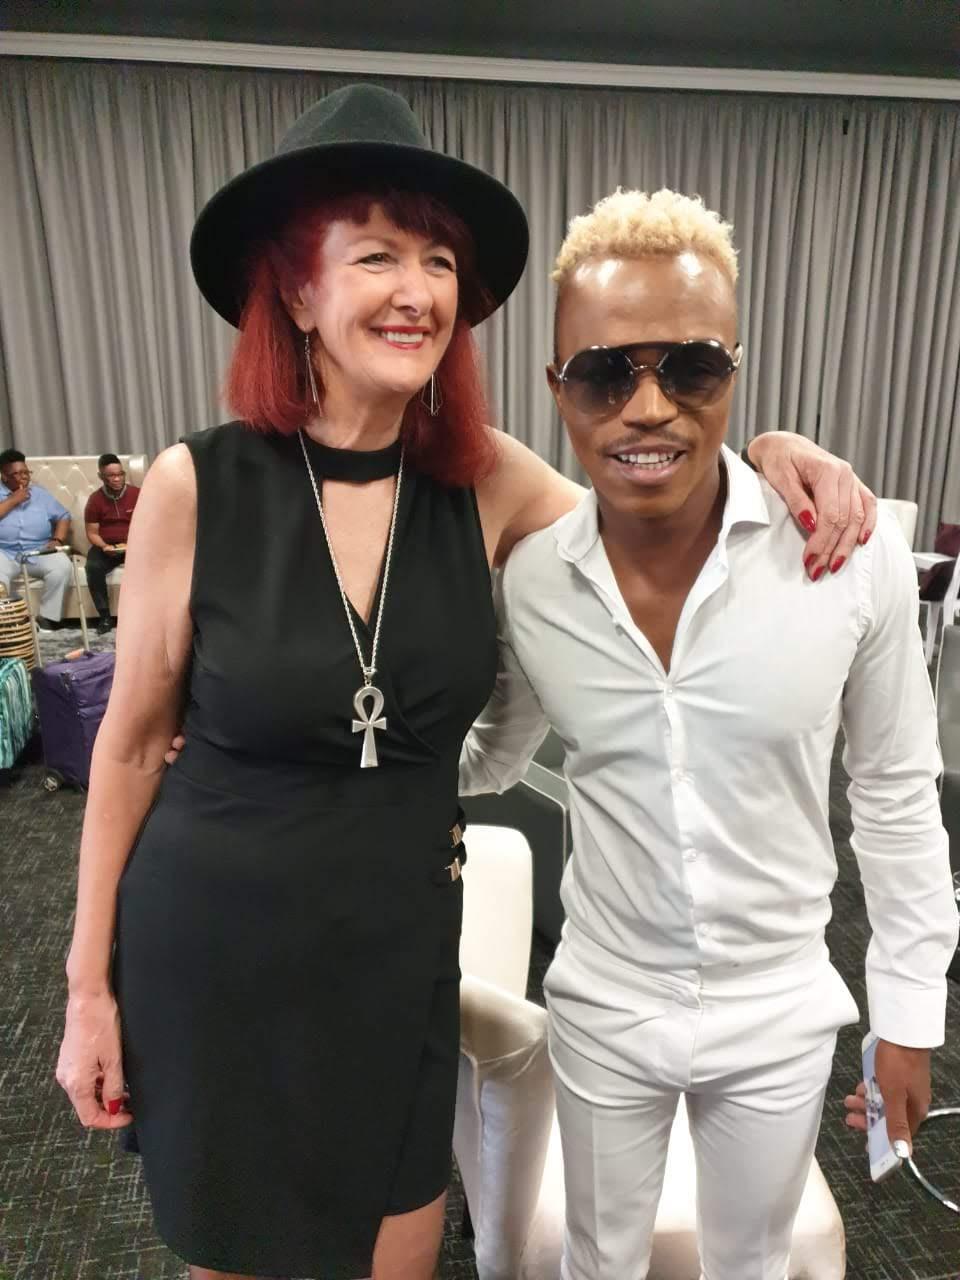 LGBTQ Steph and Somizi Mhlongo IMG-20190323-WA0018